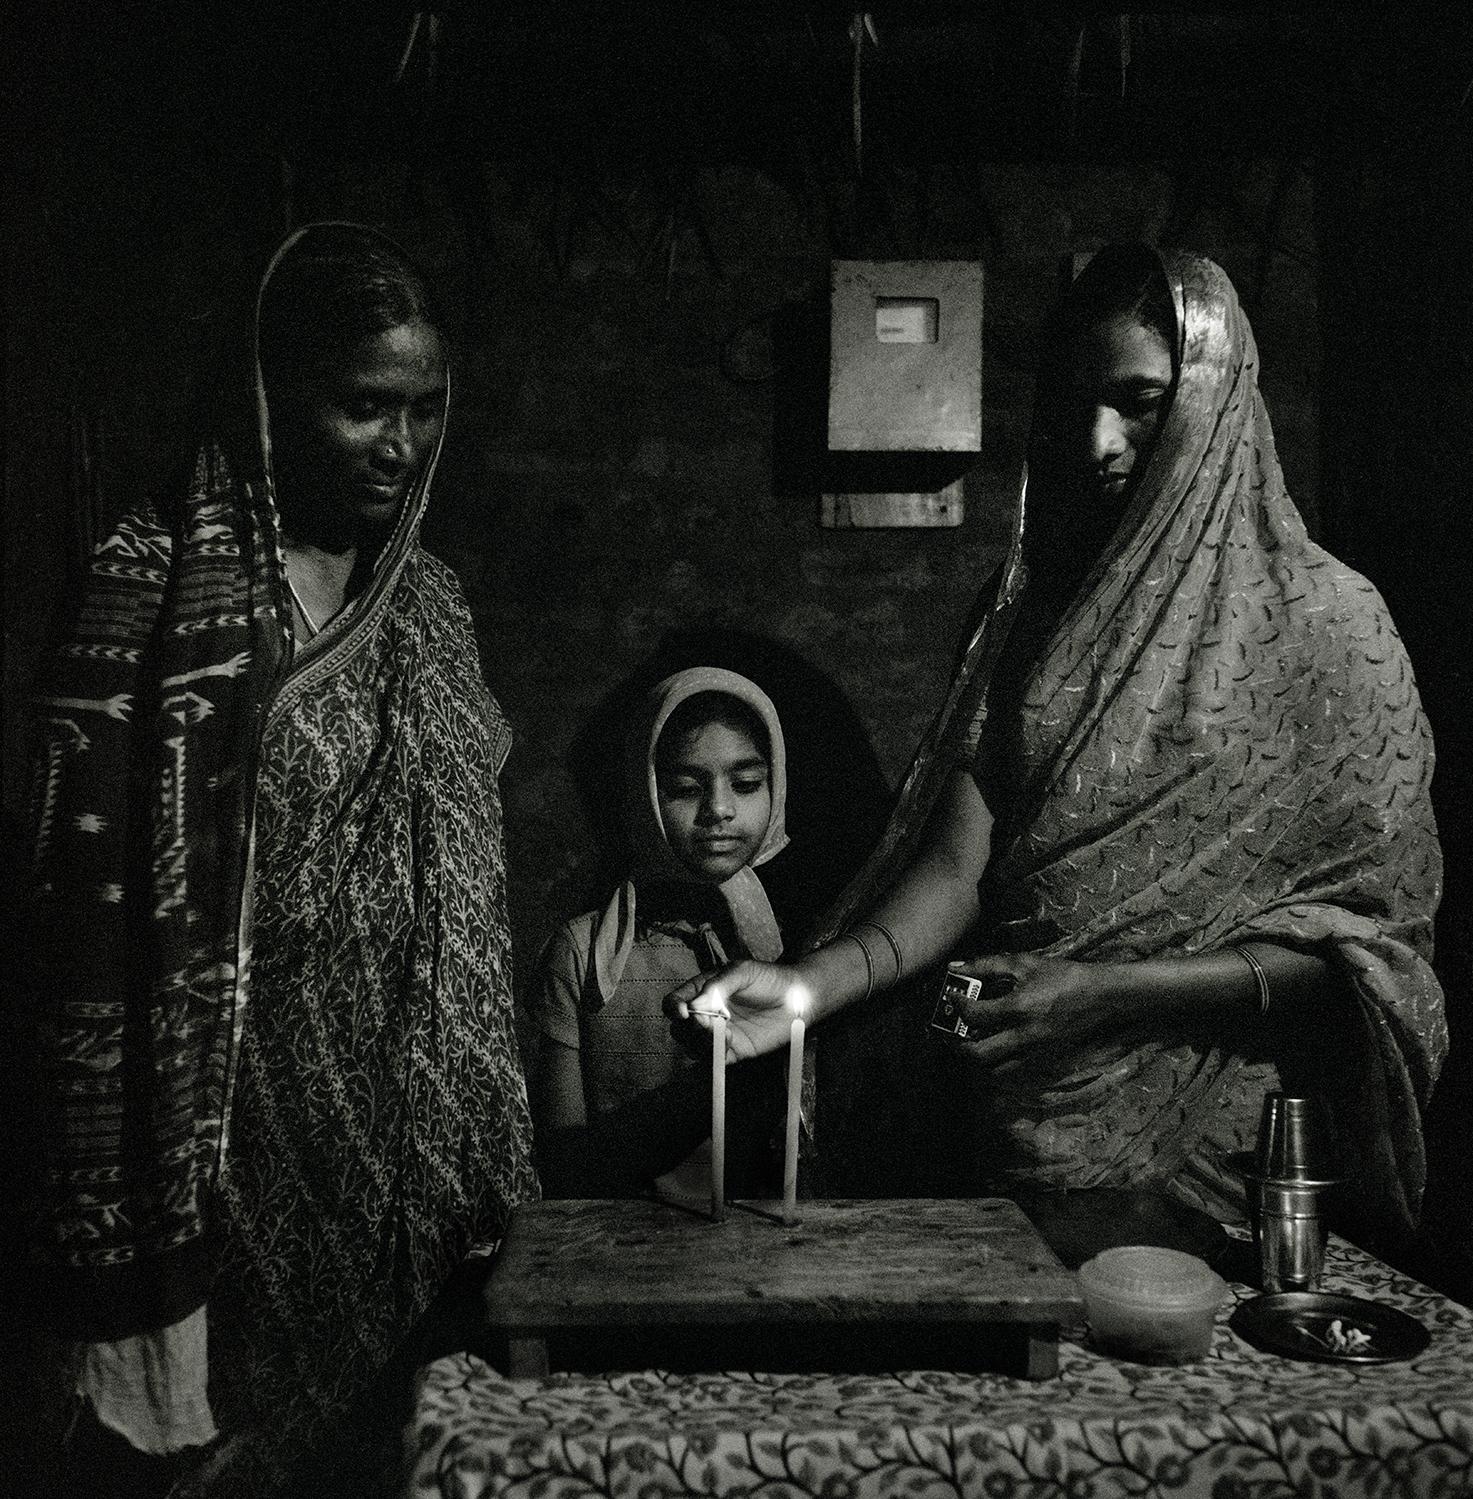 Lighting Candles- Kottareddipalem, India